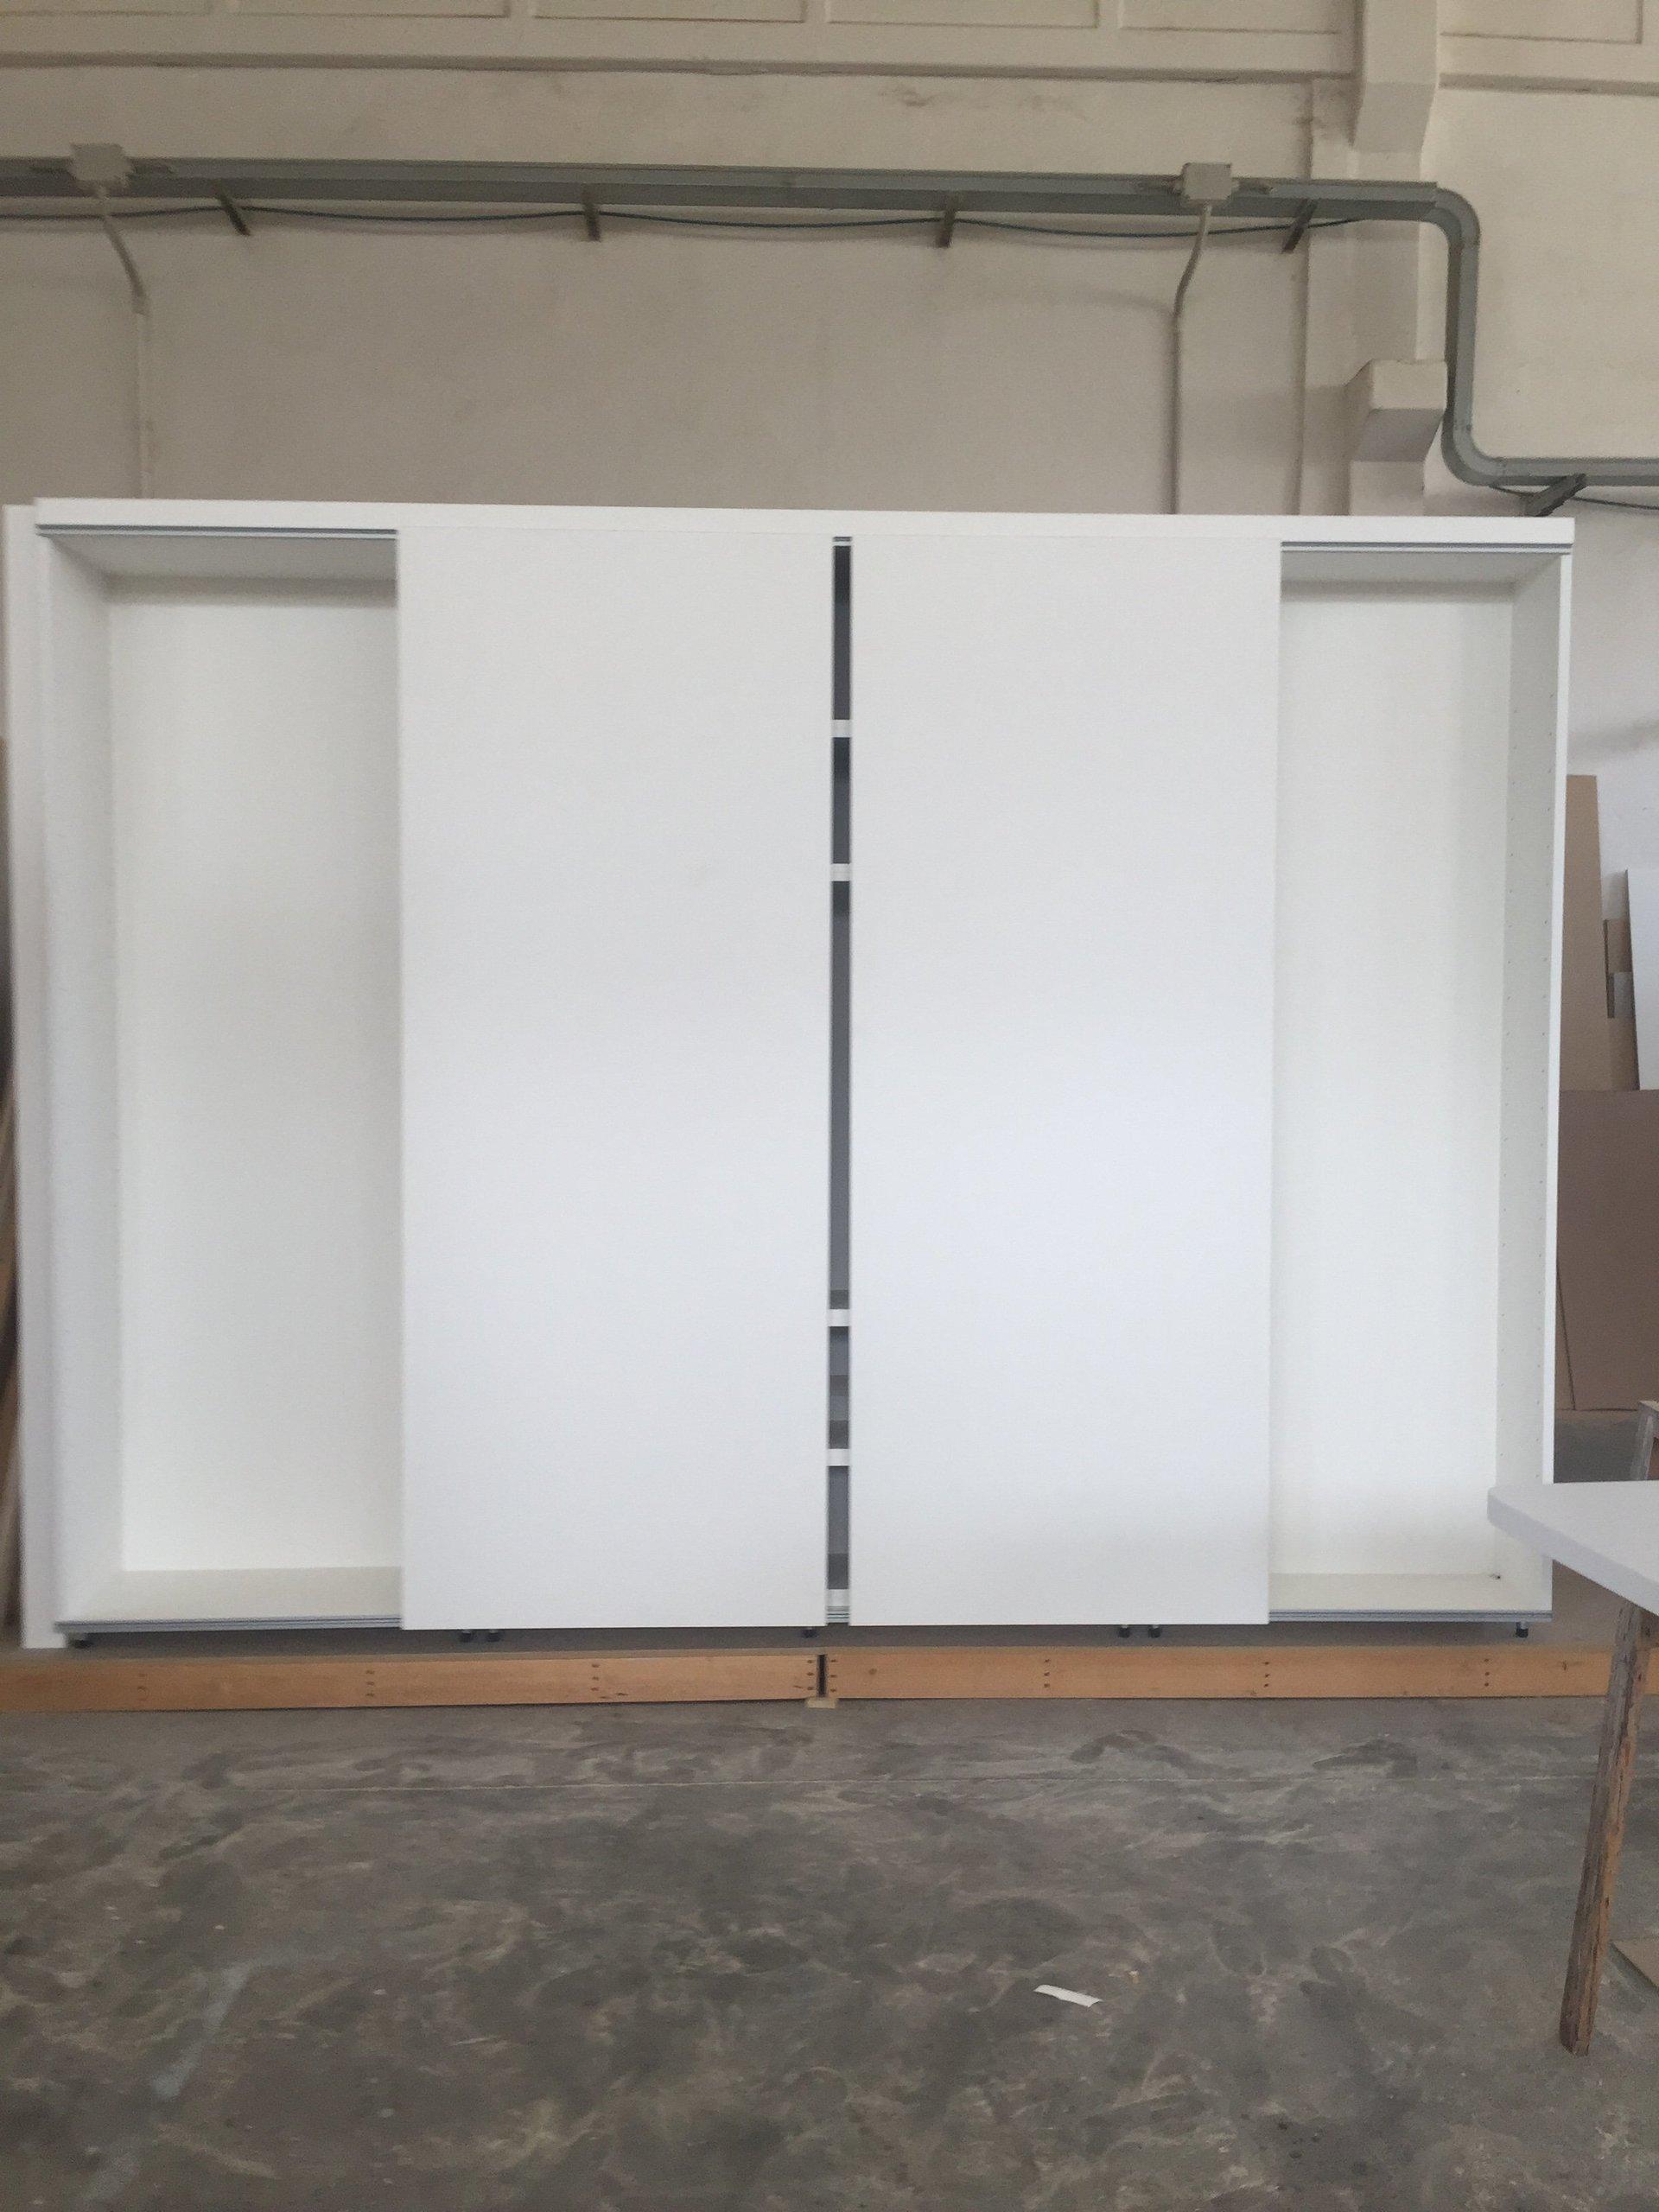 armadio bianco chiuso